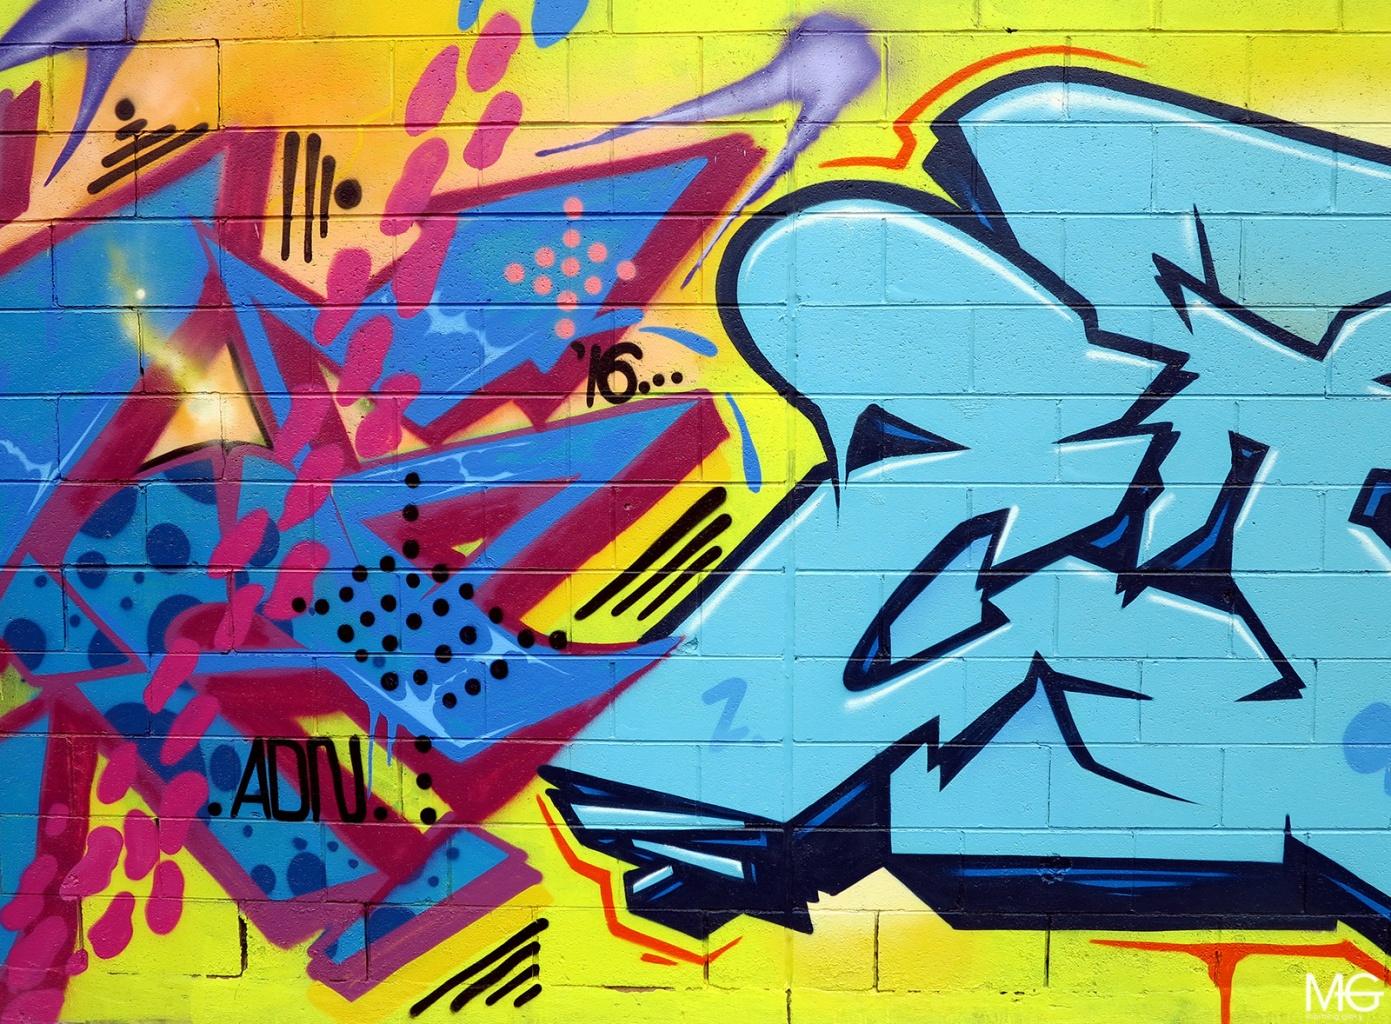 Dscreet-Rase-Ethics-Askem-Dvate-Brunswick-Graffiti-Morning-Glory-Melbourne6